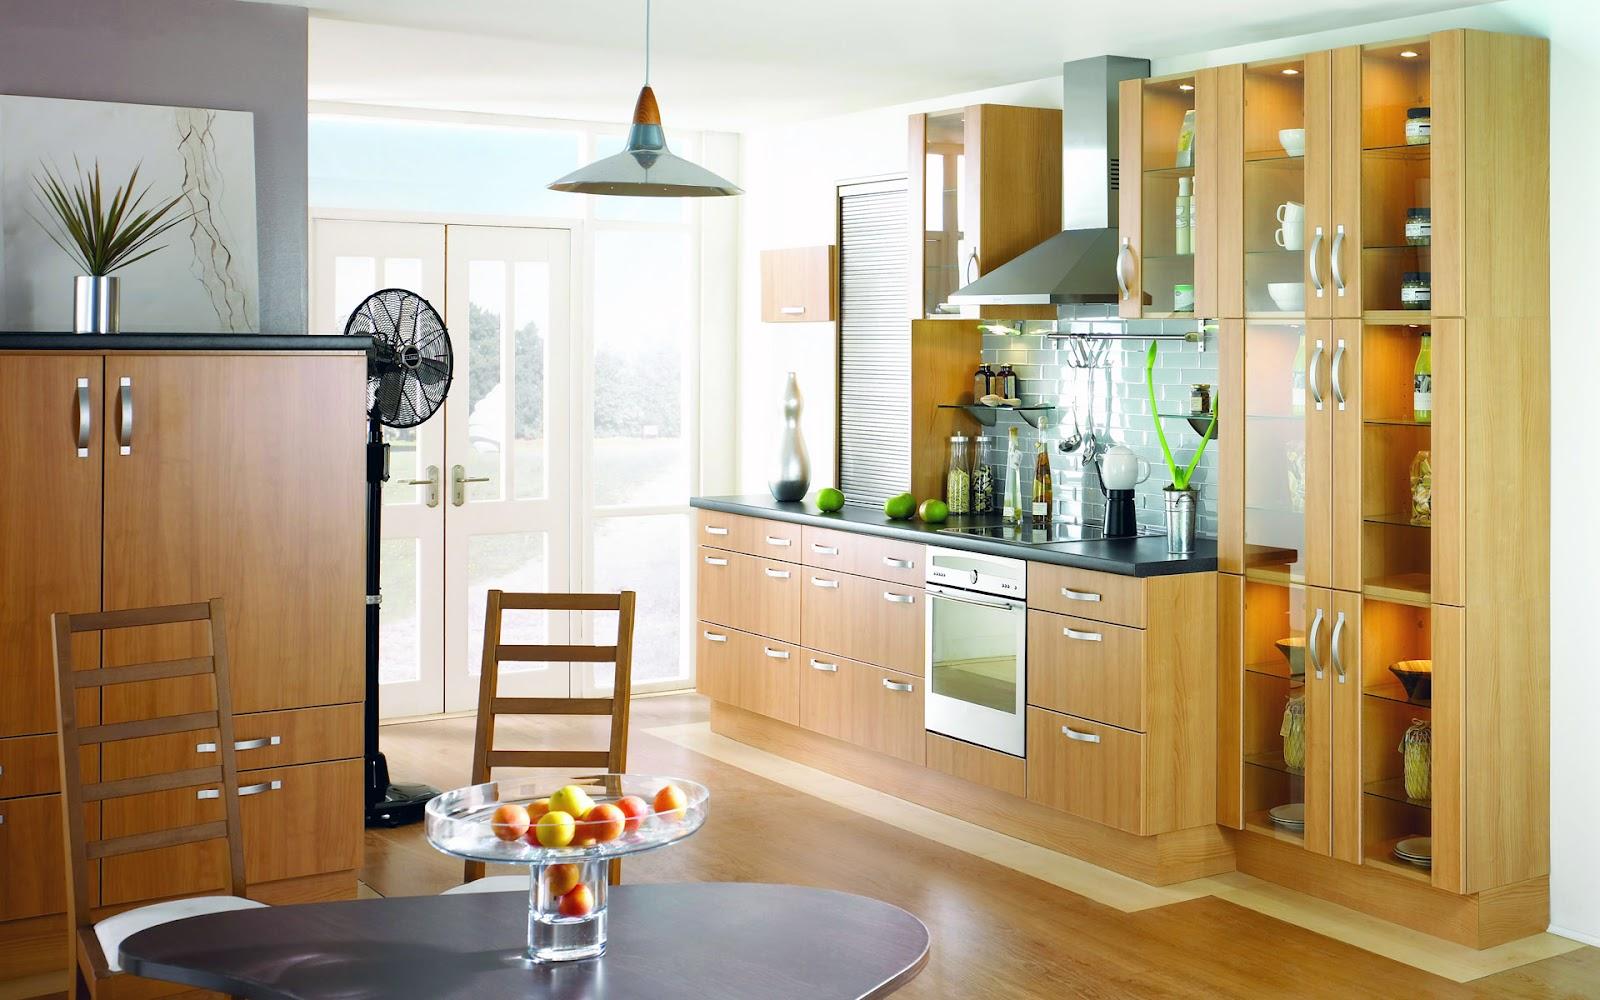 http://3.bp.blogspot.com/-Xum01bZEsX8/T2JMzGCF0cI/AAAAAAAACkc/FFZCeI9CvHI/s1600/Brilliant-Kitchen-Decoration-Ideas.jpg